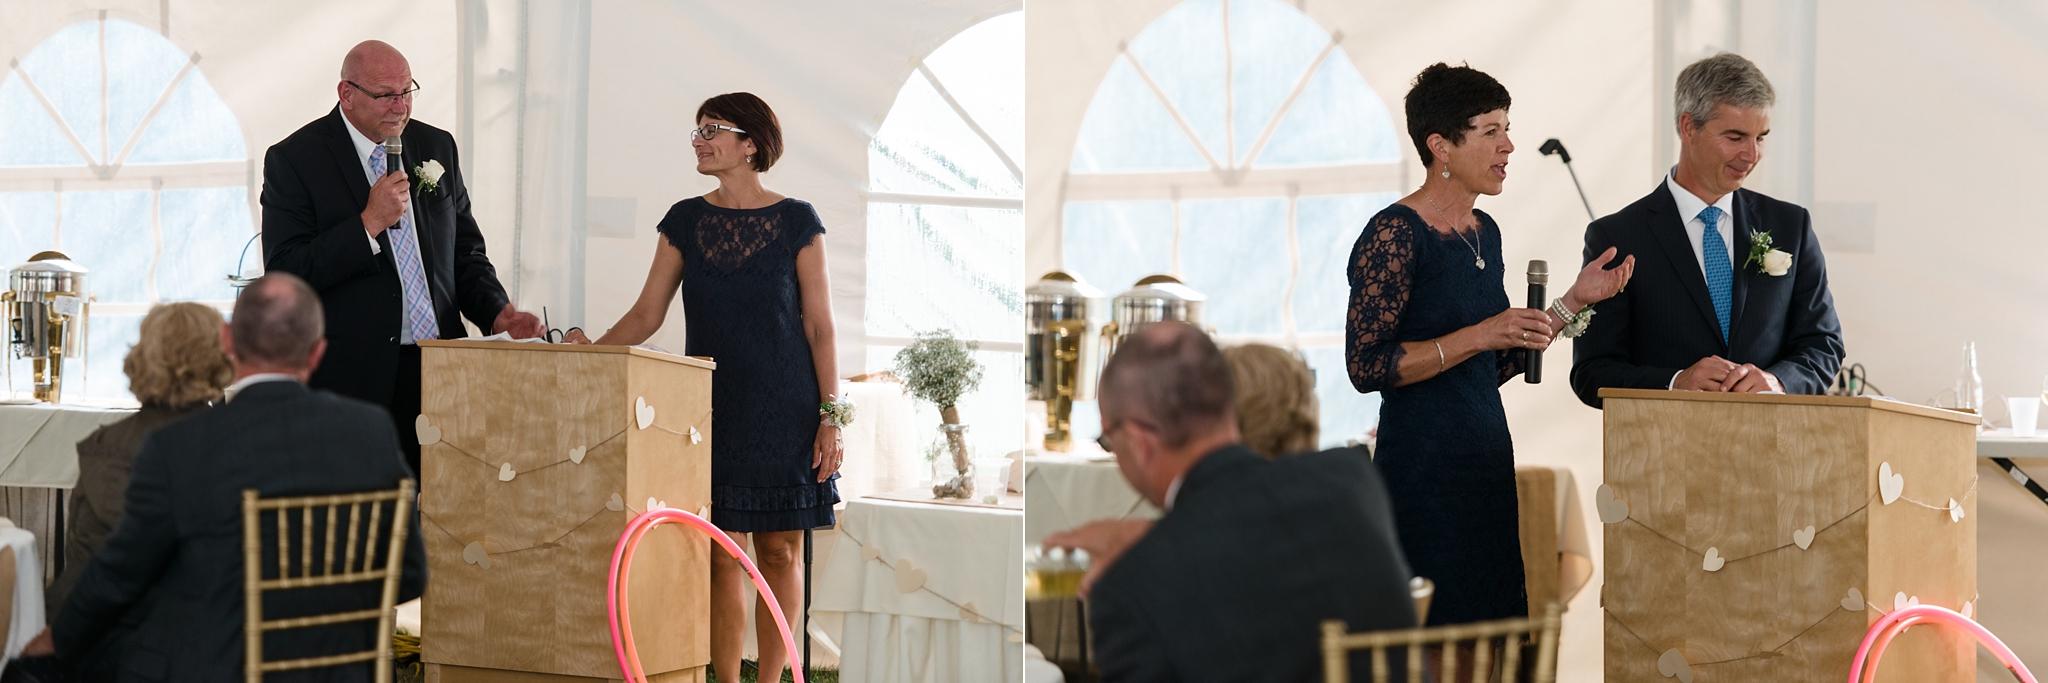 kaihla_tonai_intimate_wedding_elopement_photographer_0076